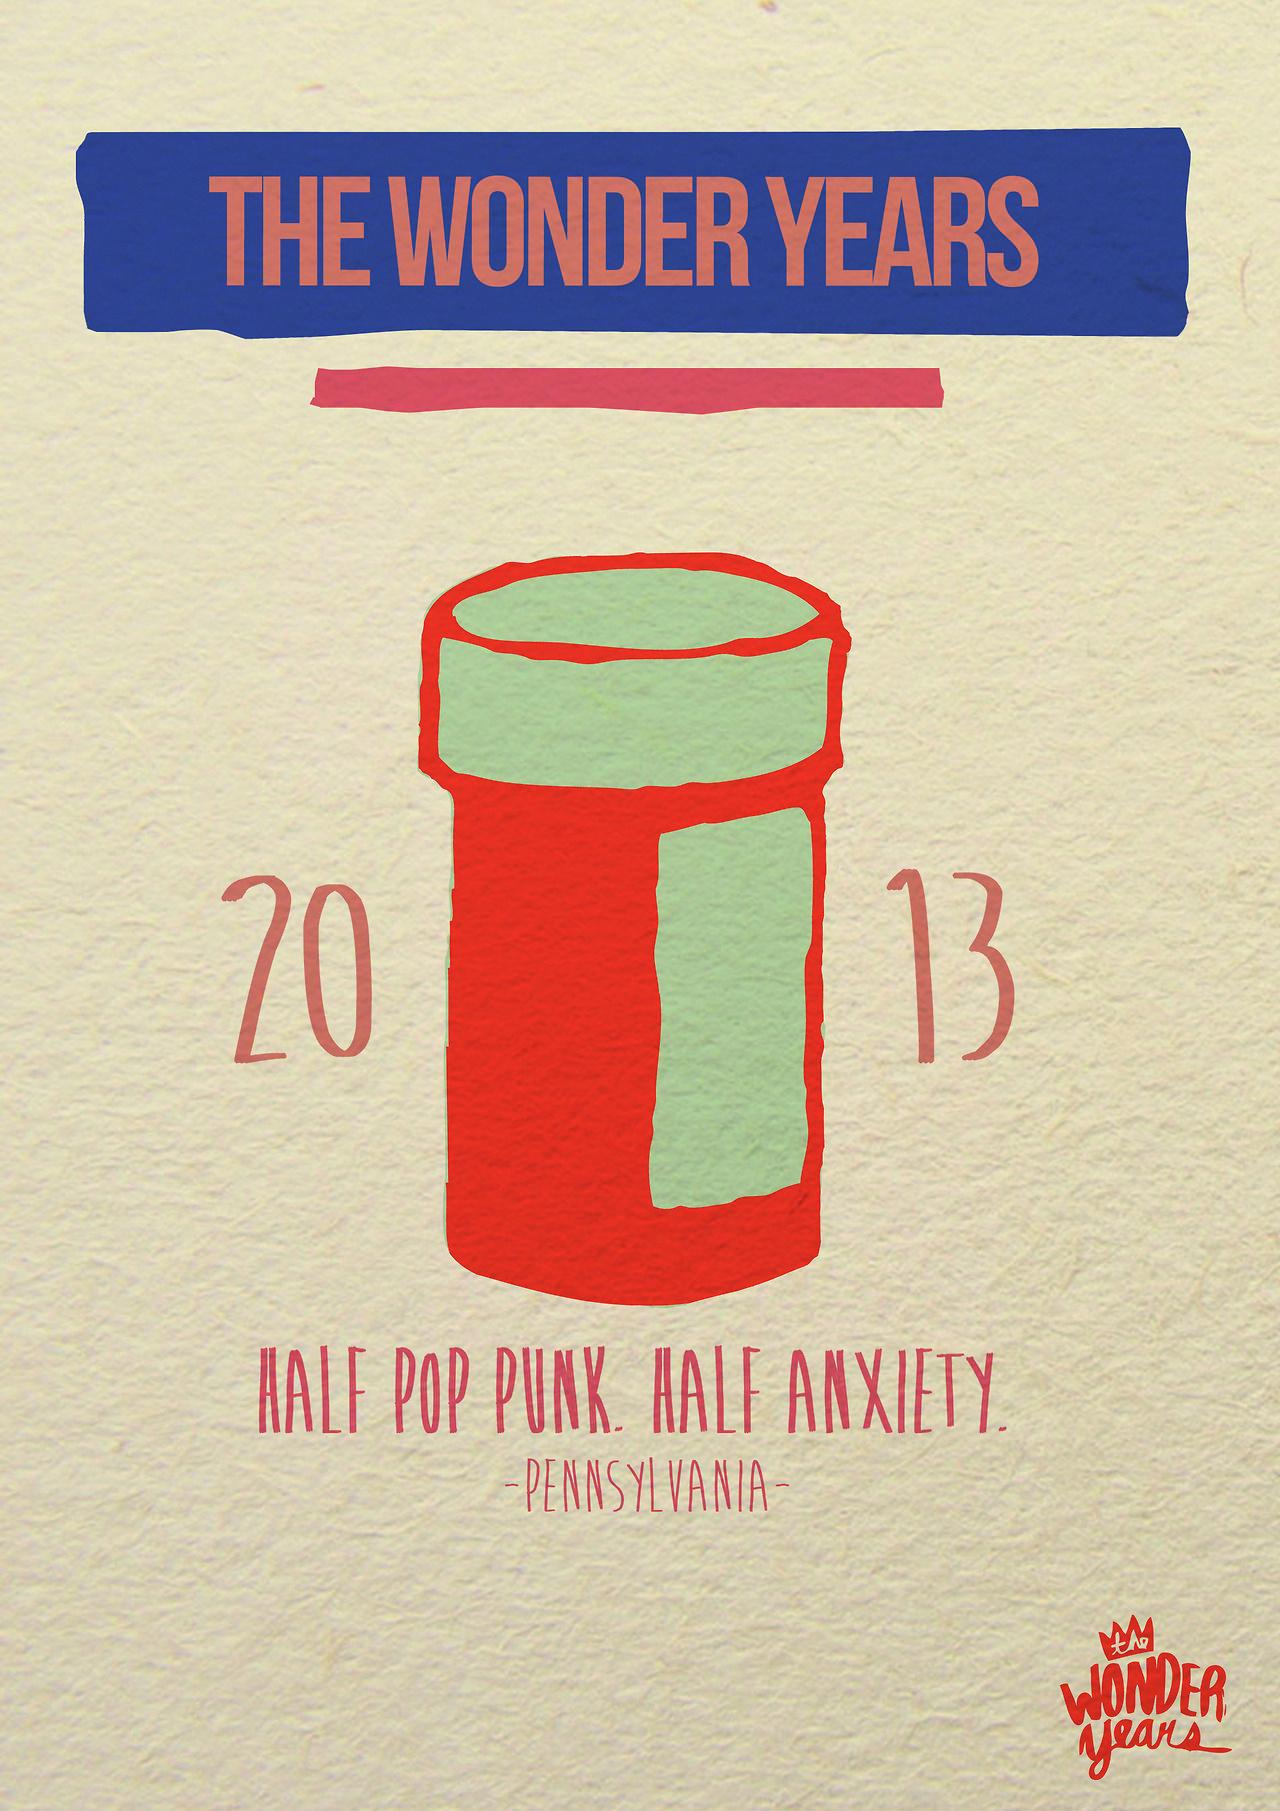 The Wonder Years Pop punk music, Pop punk, Pop punk bands